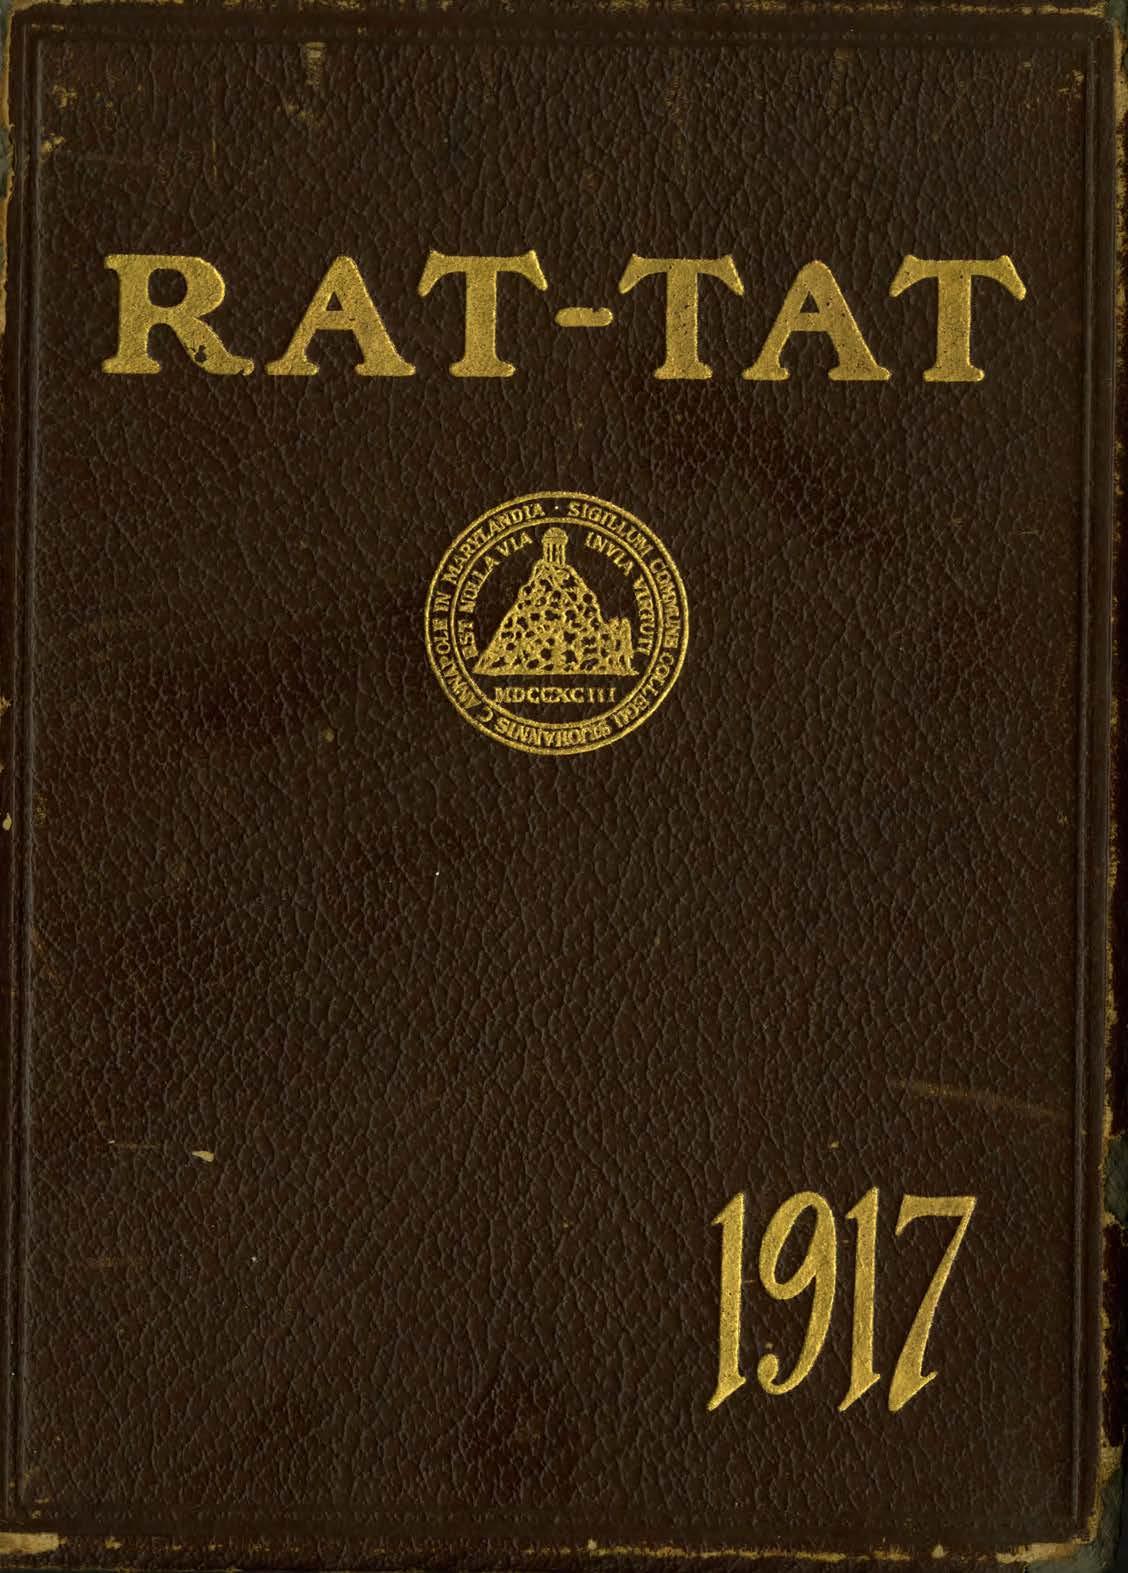 Rat-Tat 1917